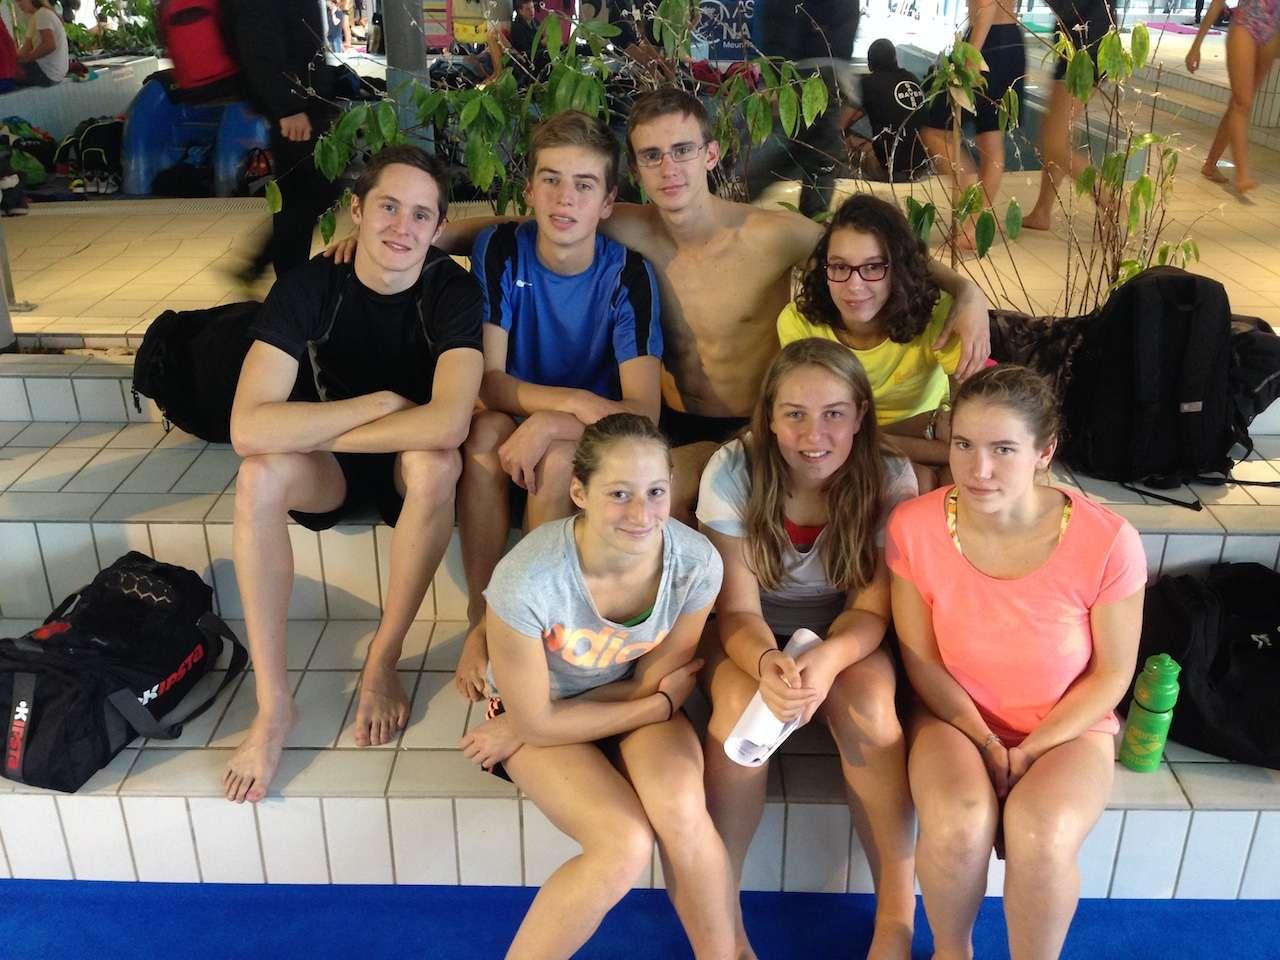 Groupes natation langres natation 52 for Club piscine st jerome liquidation